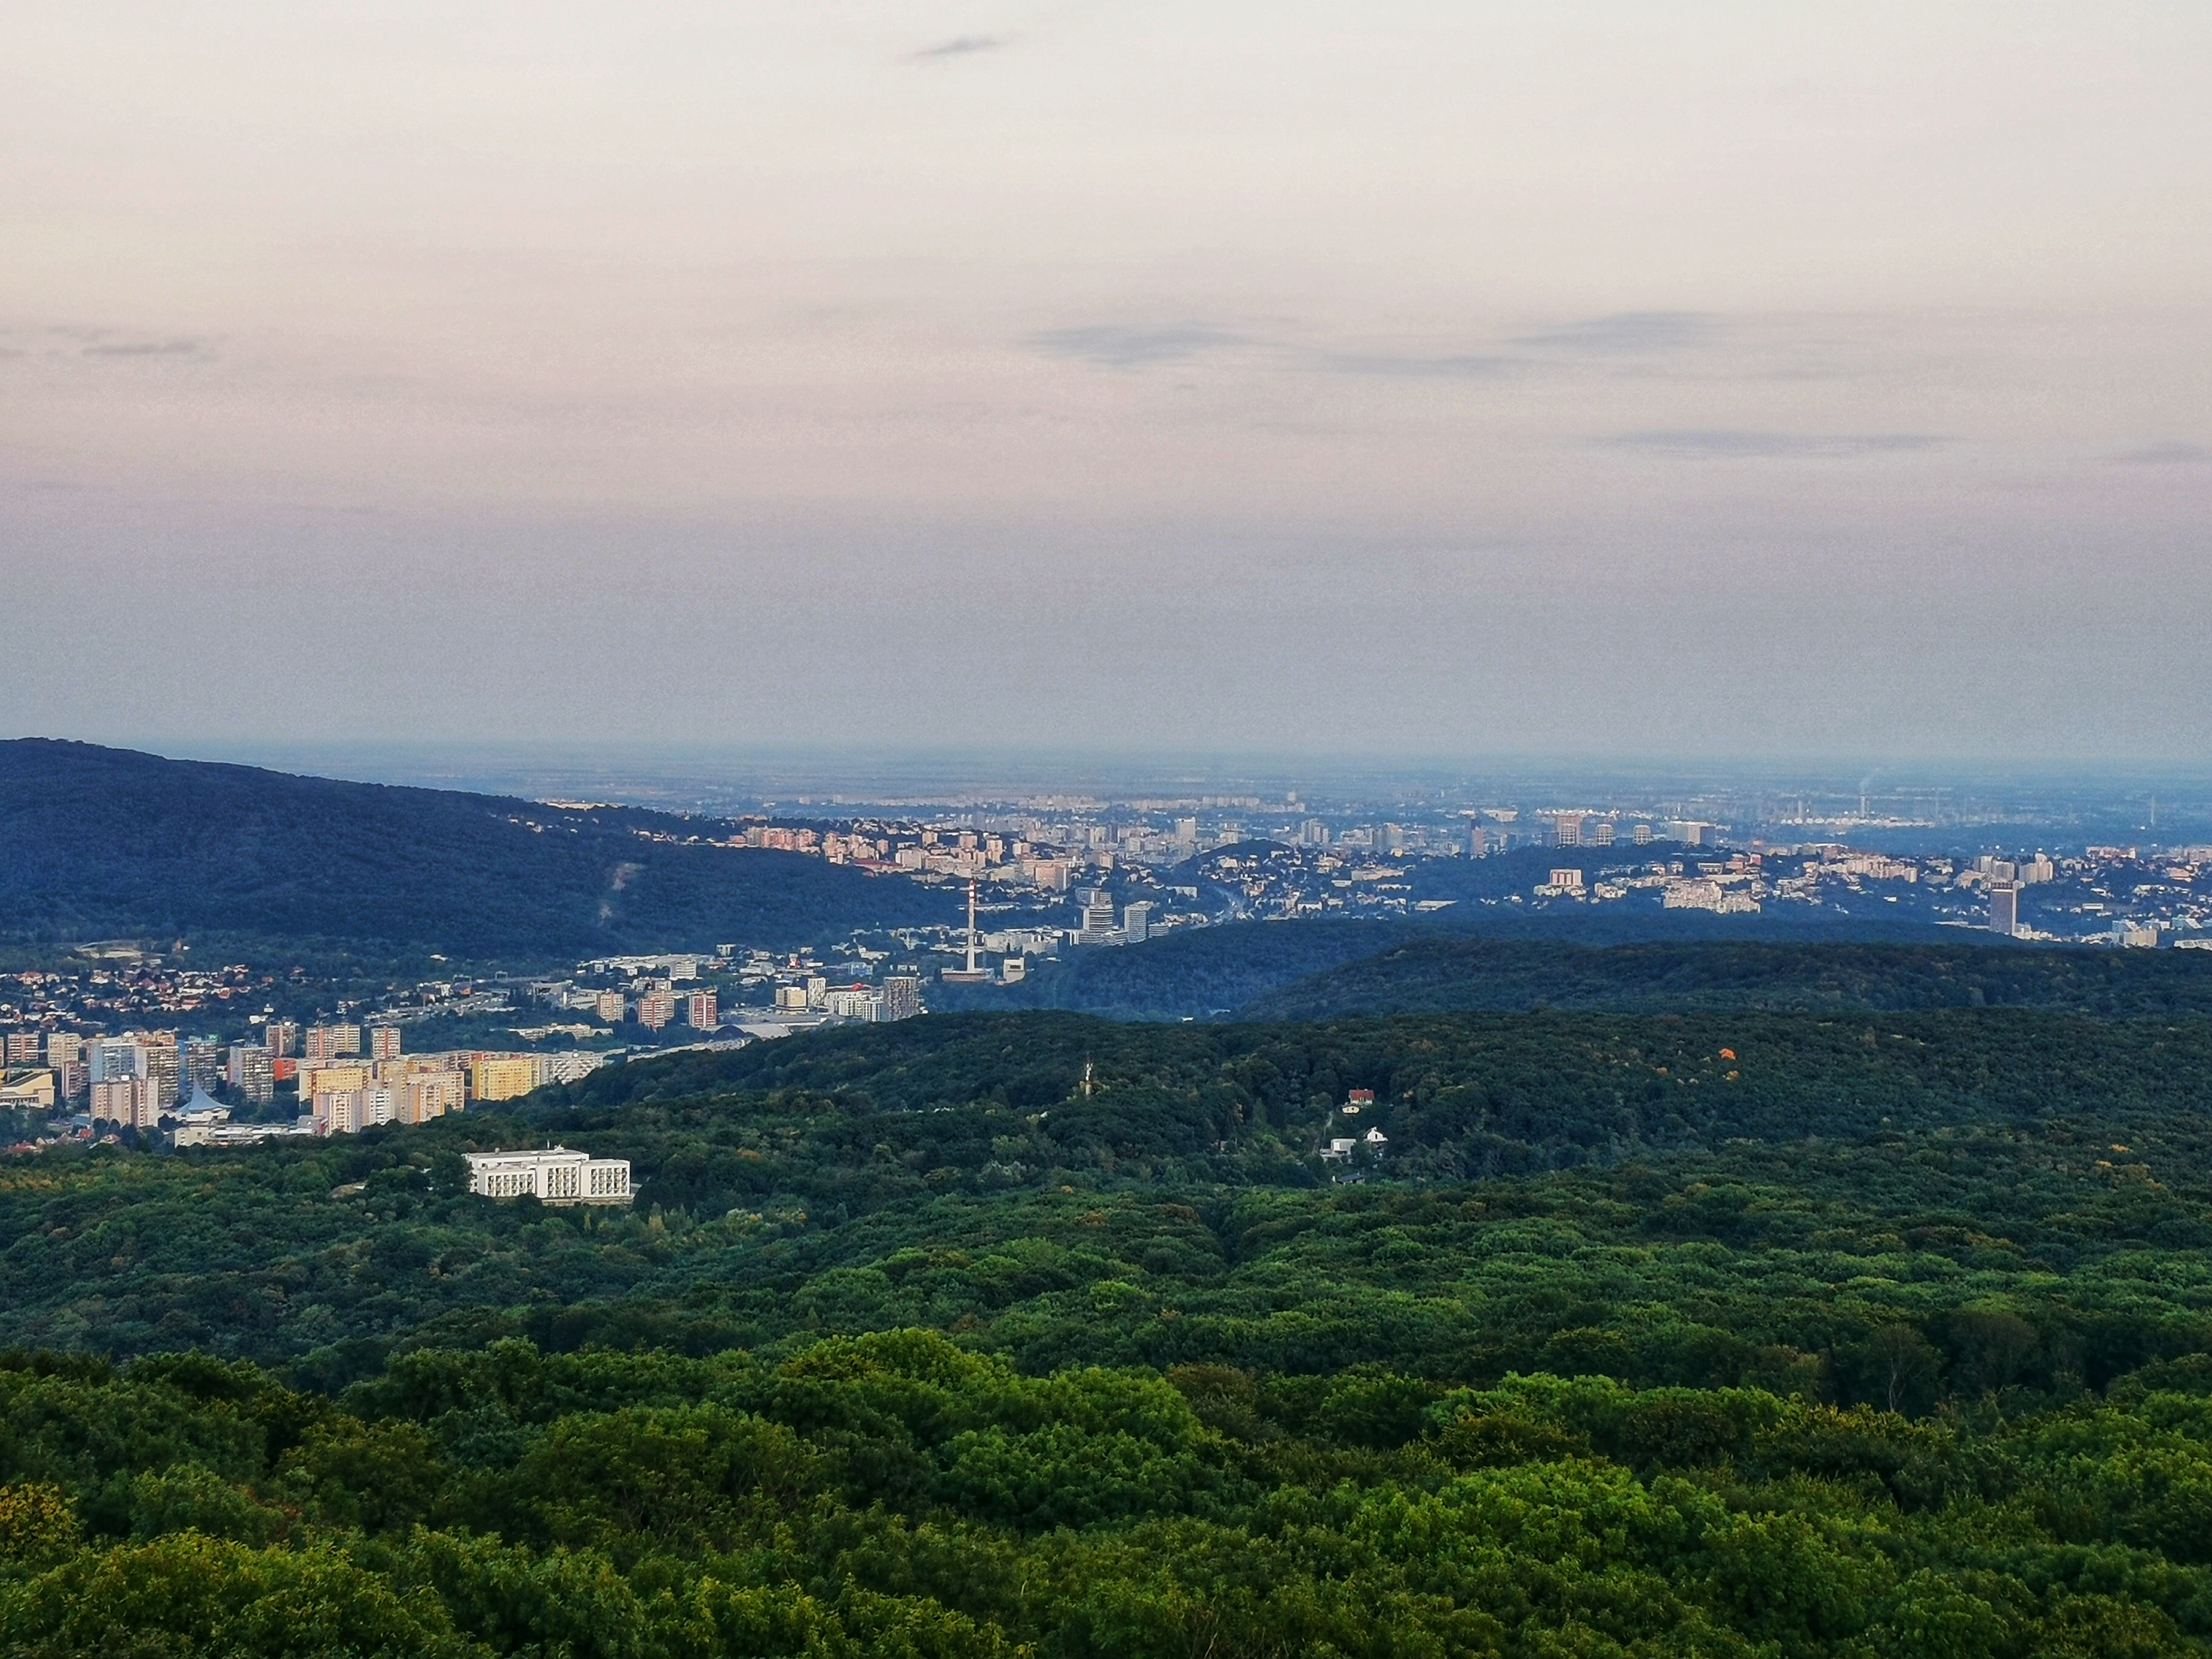 Bratislava as seen from Devínska Kobyla lookout tower.